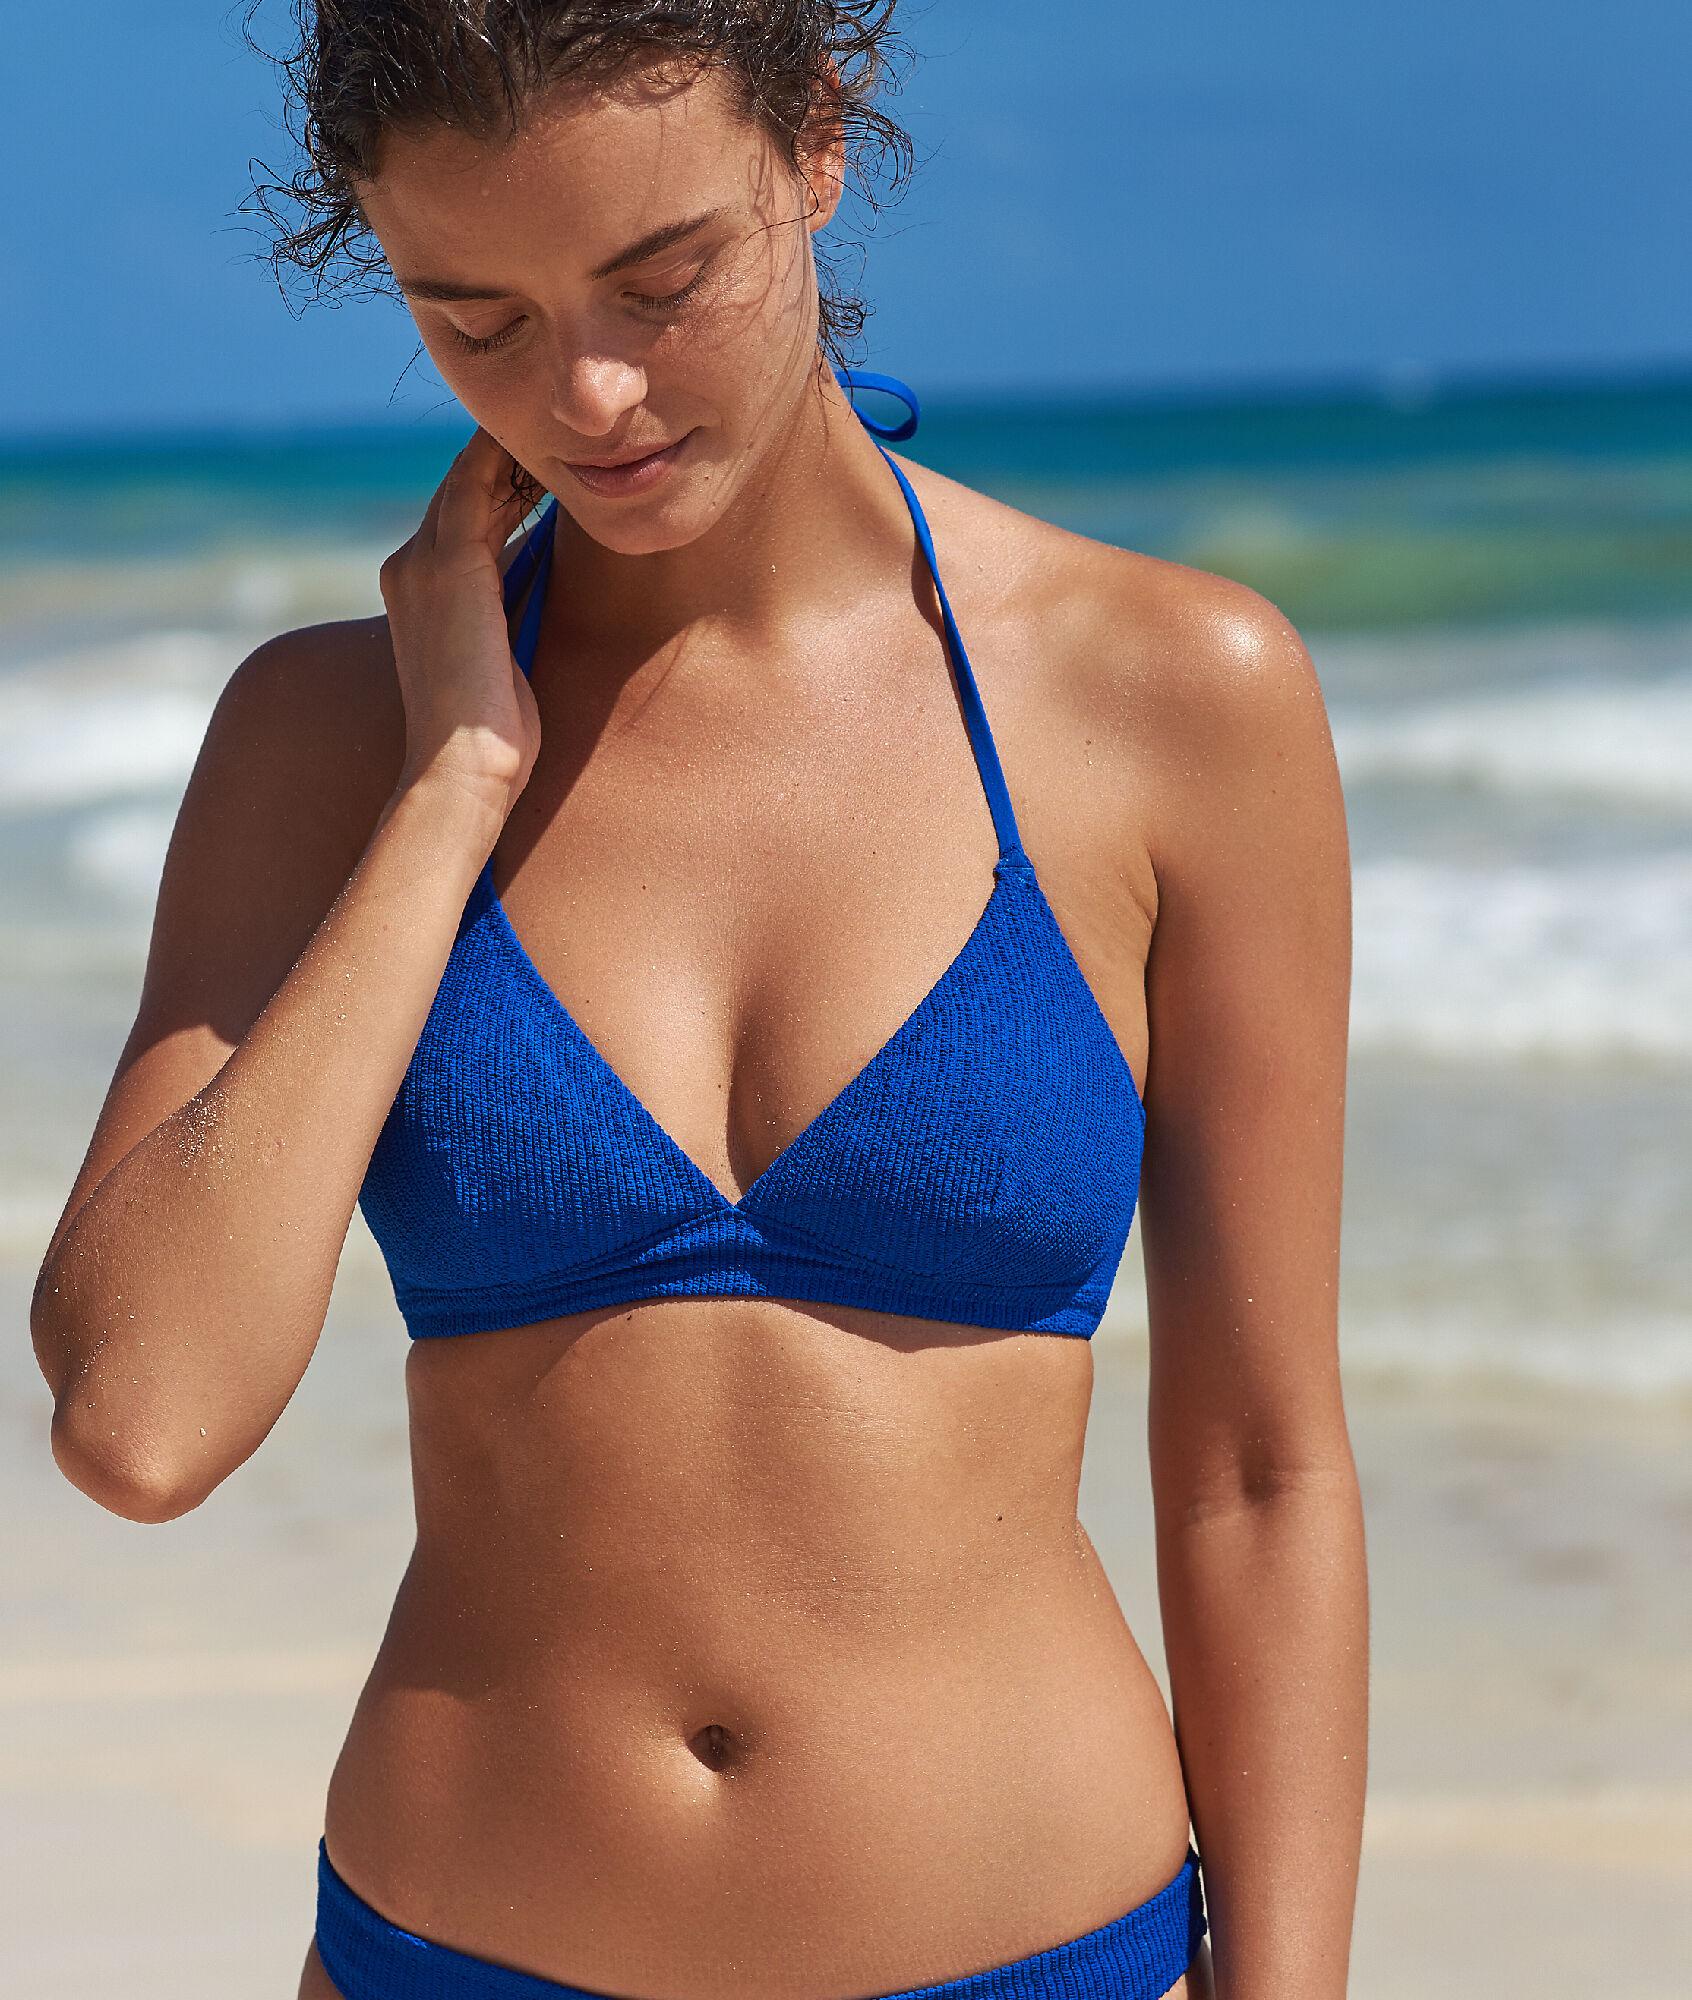 438d0def 2019 ✓ Moda Tendencias Etam Baño Bañadores Mujer W92IEDH